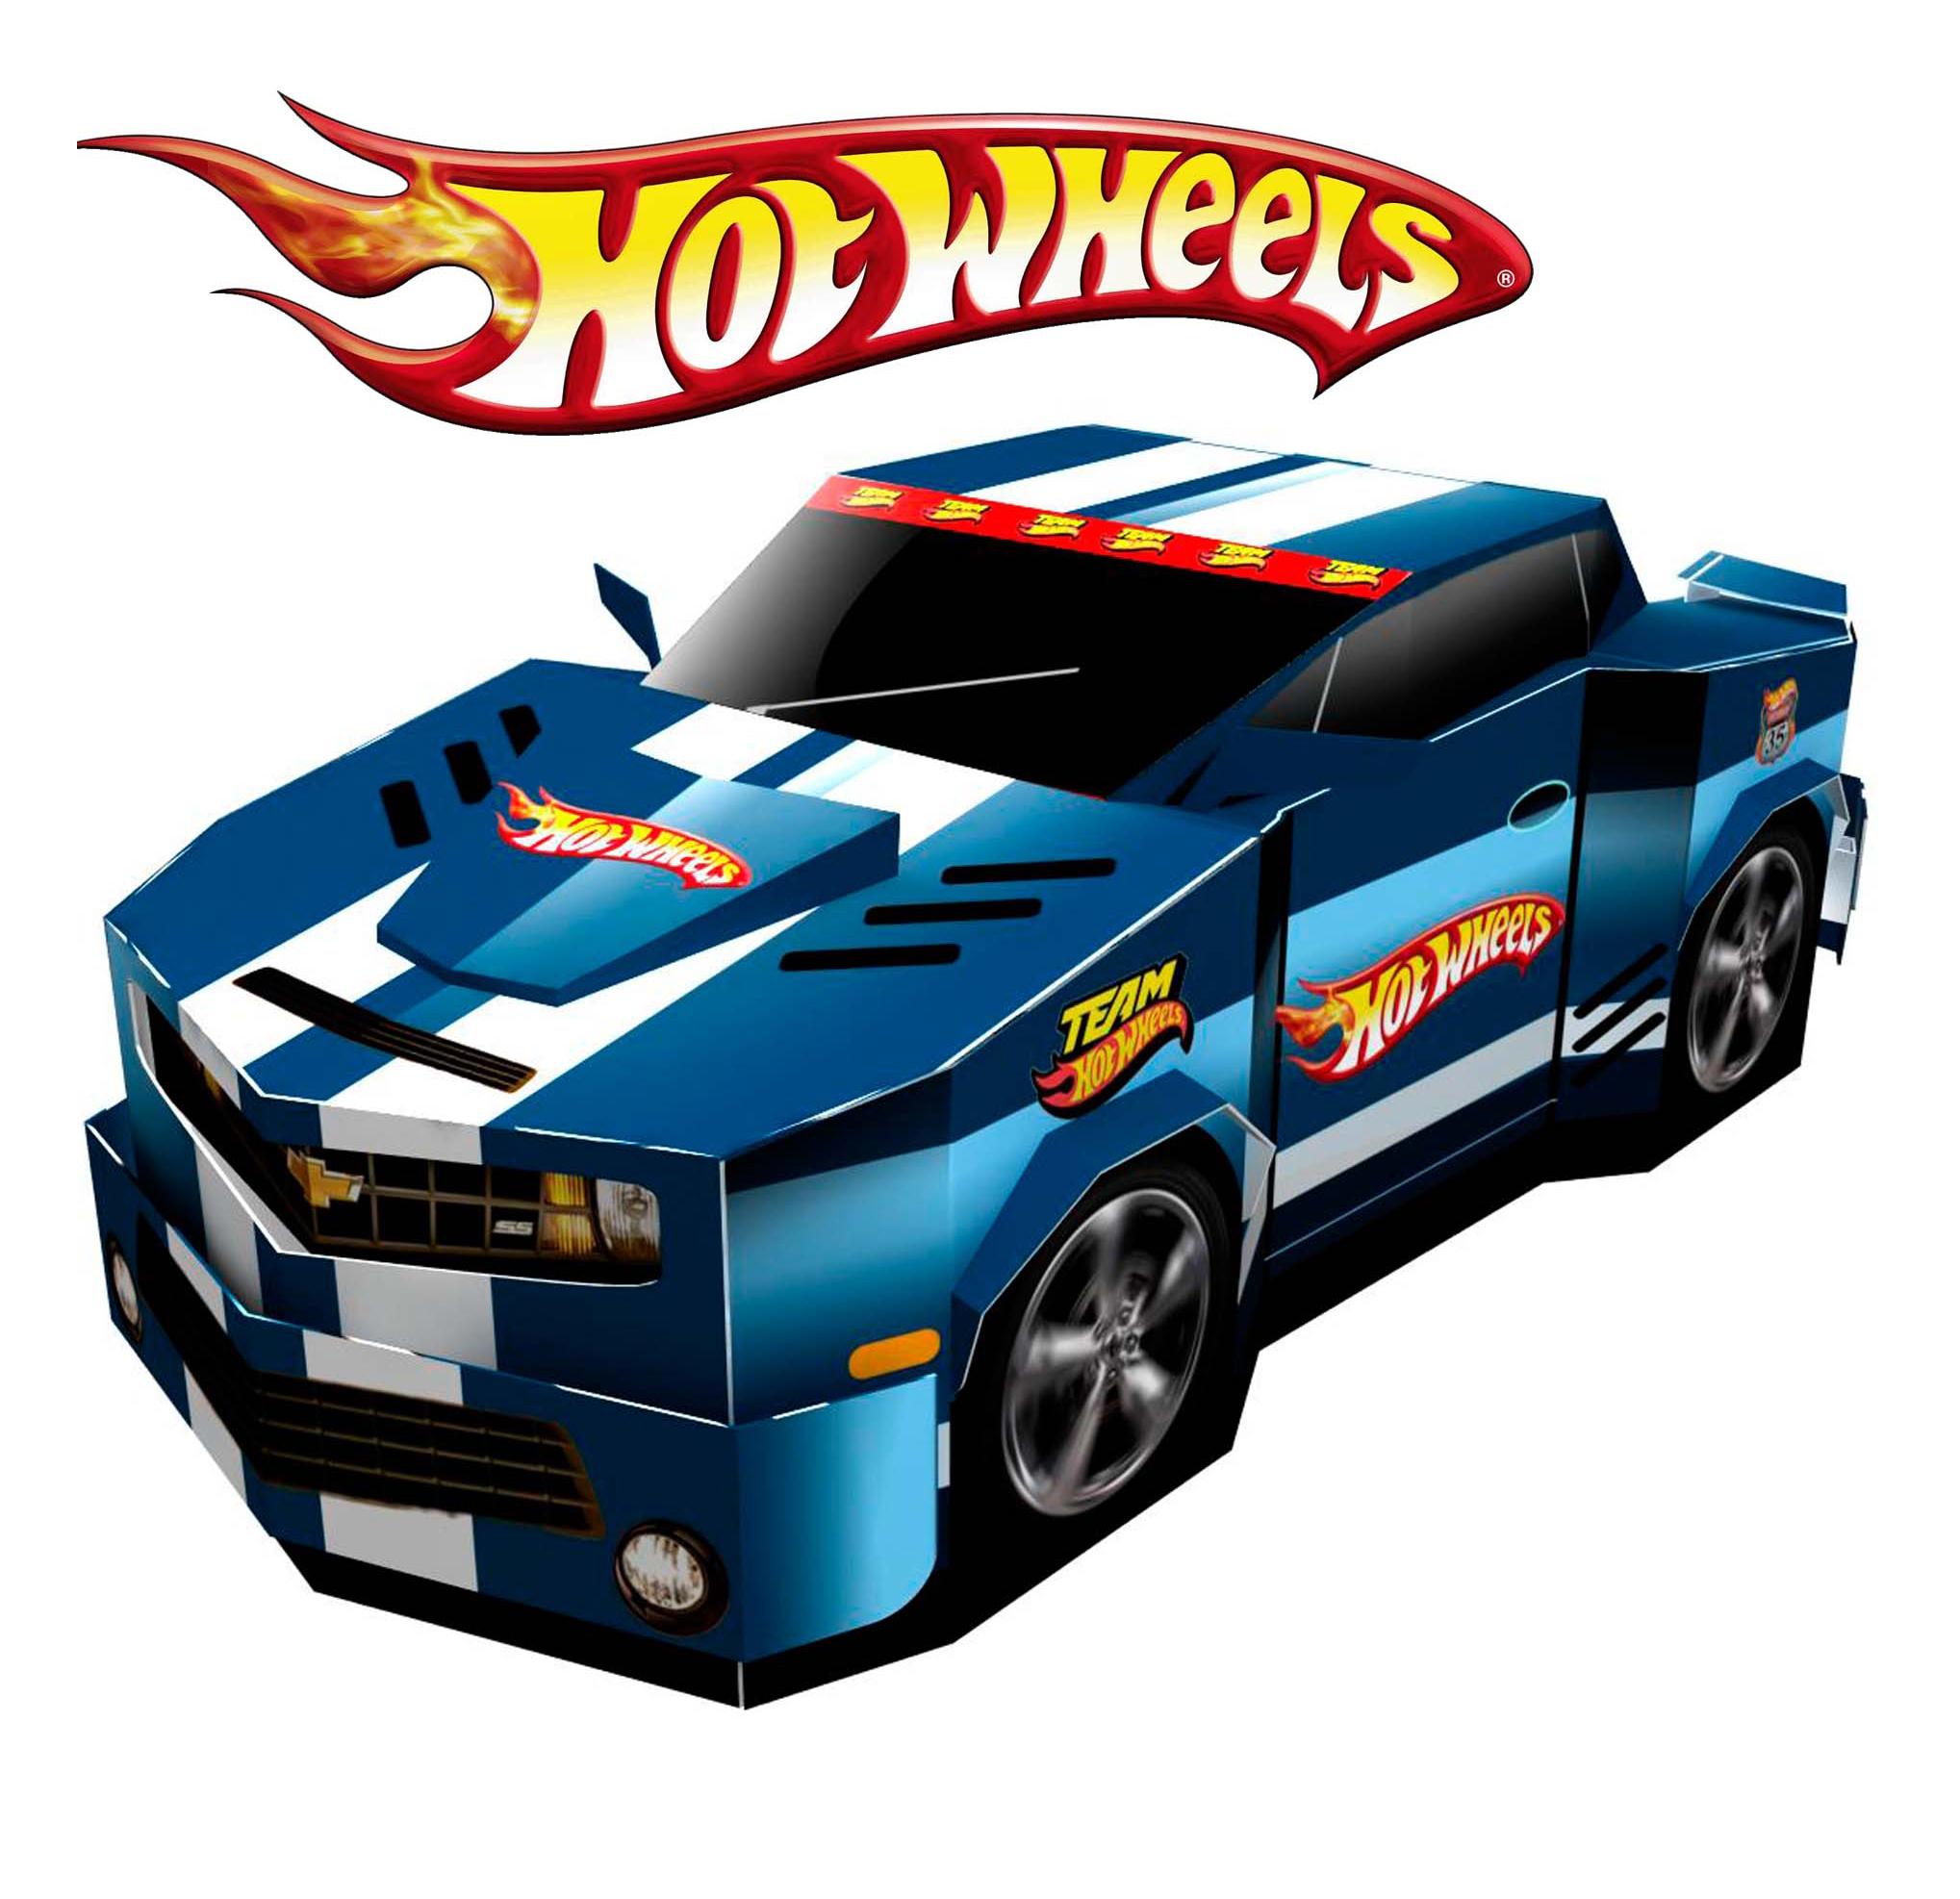 Hot Wheels Cars Clip Art N9 free image.